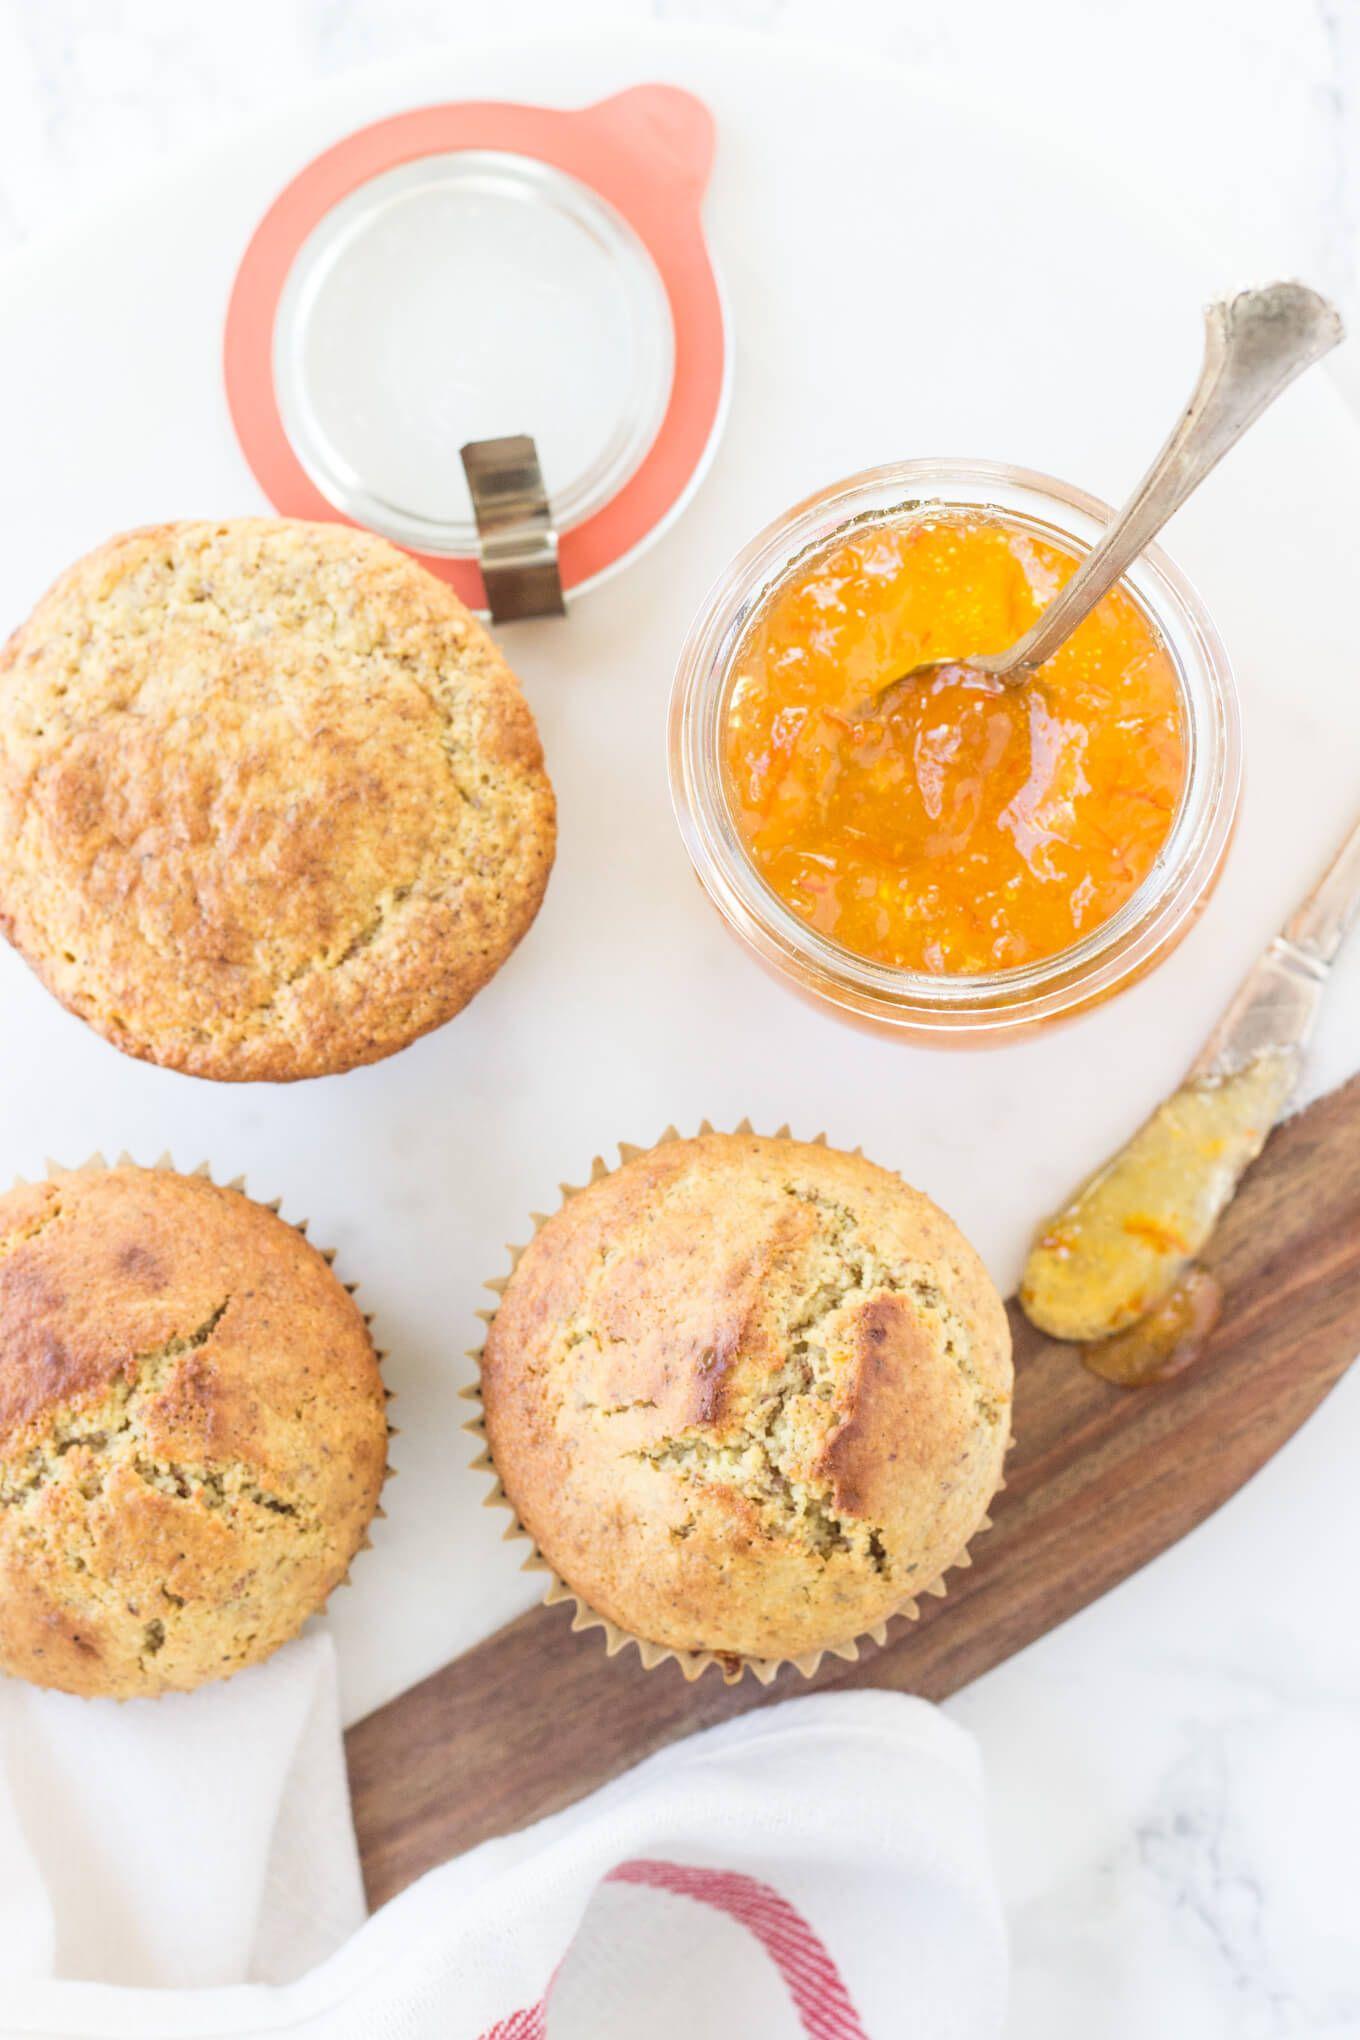 These Paleo Orange Marmalade Muffins are bursting with bright orange flavors!